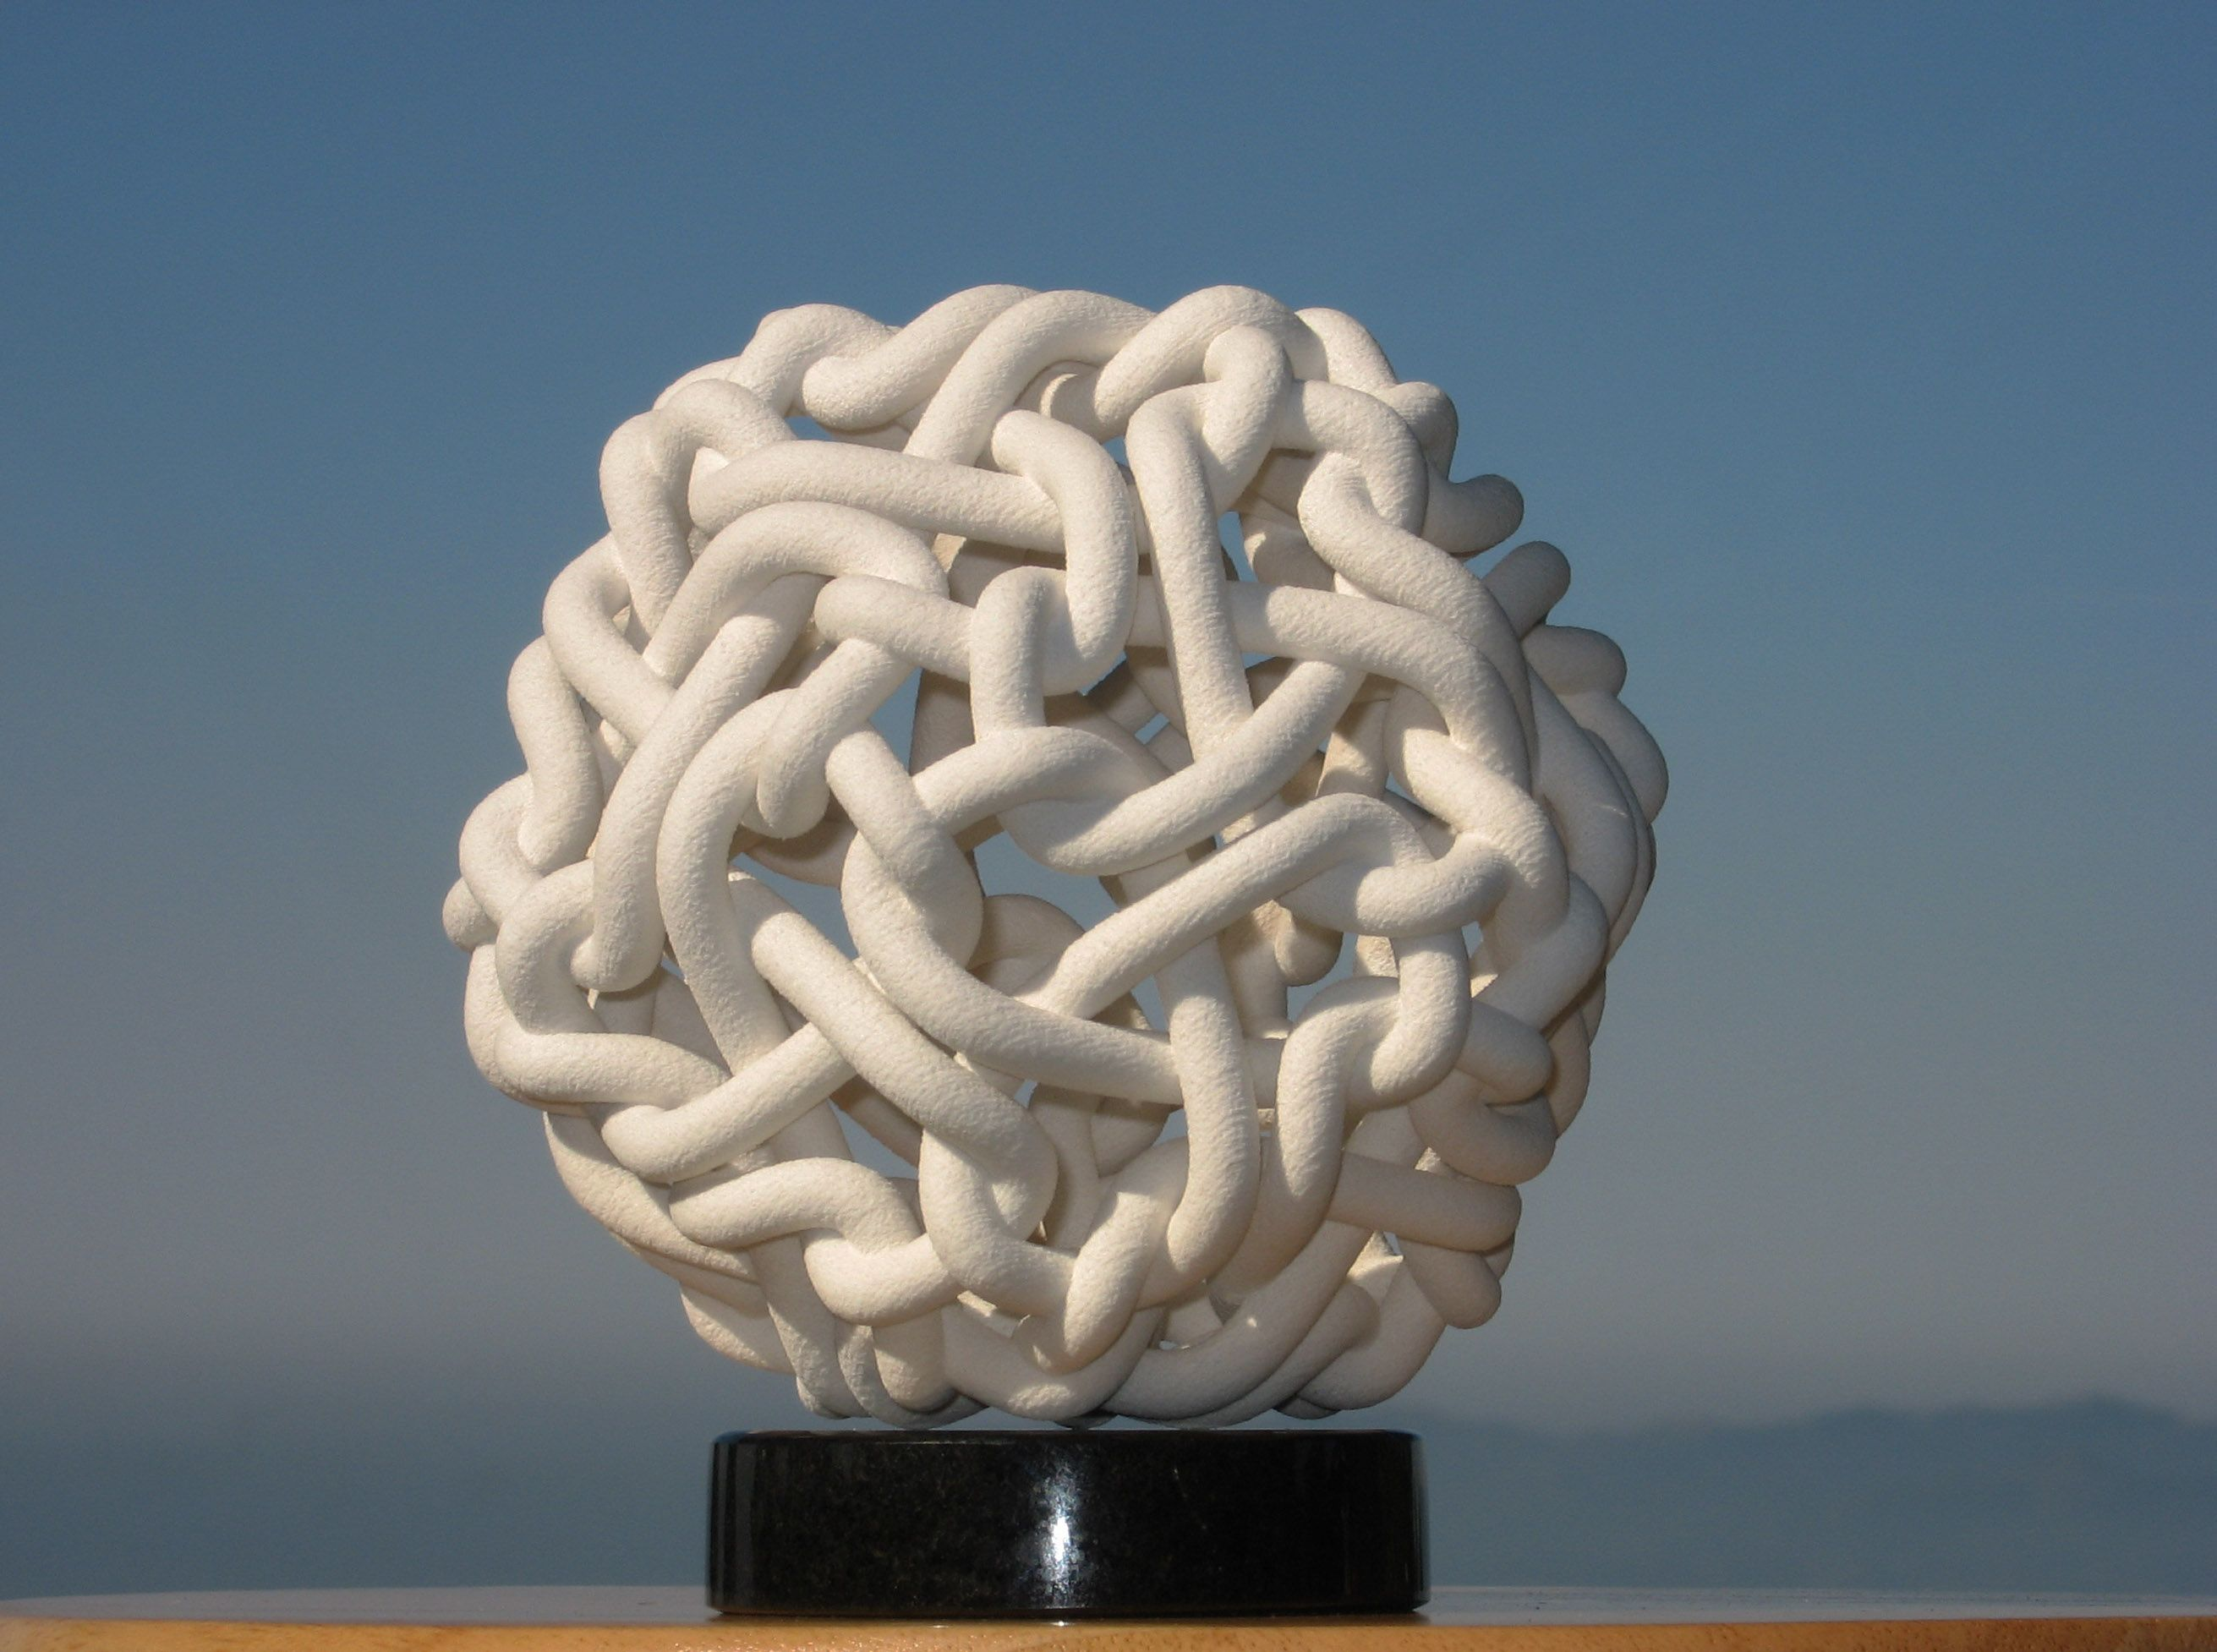 famous 3d art sculpturesMathematical Sculpture Valencia 2006 ...